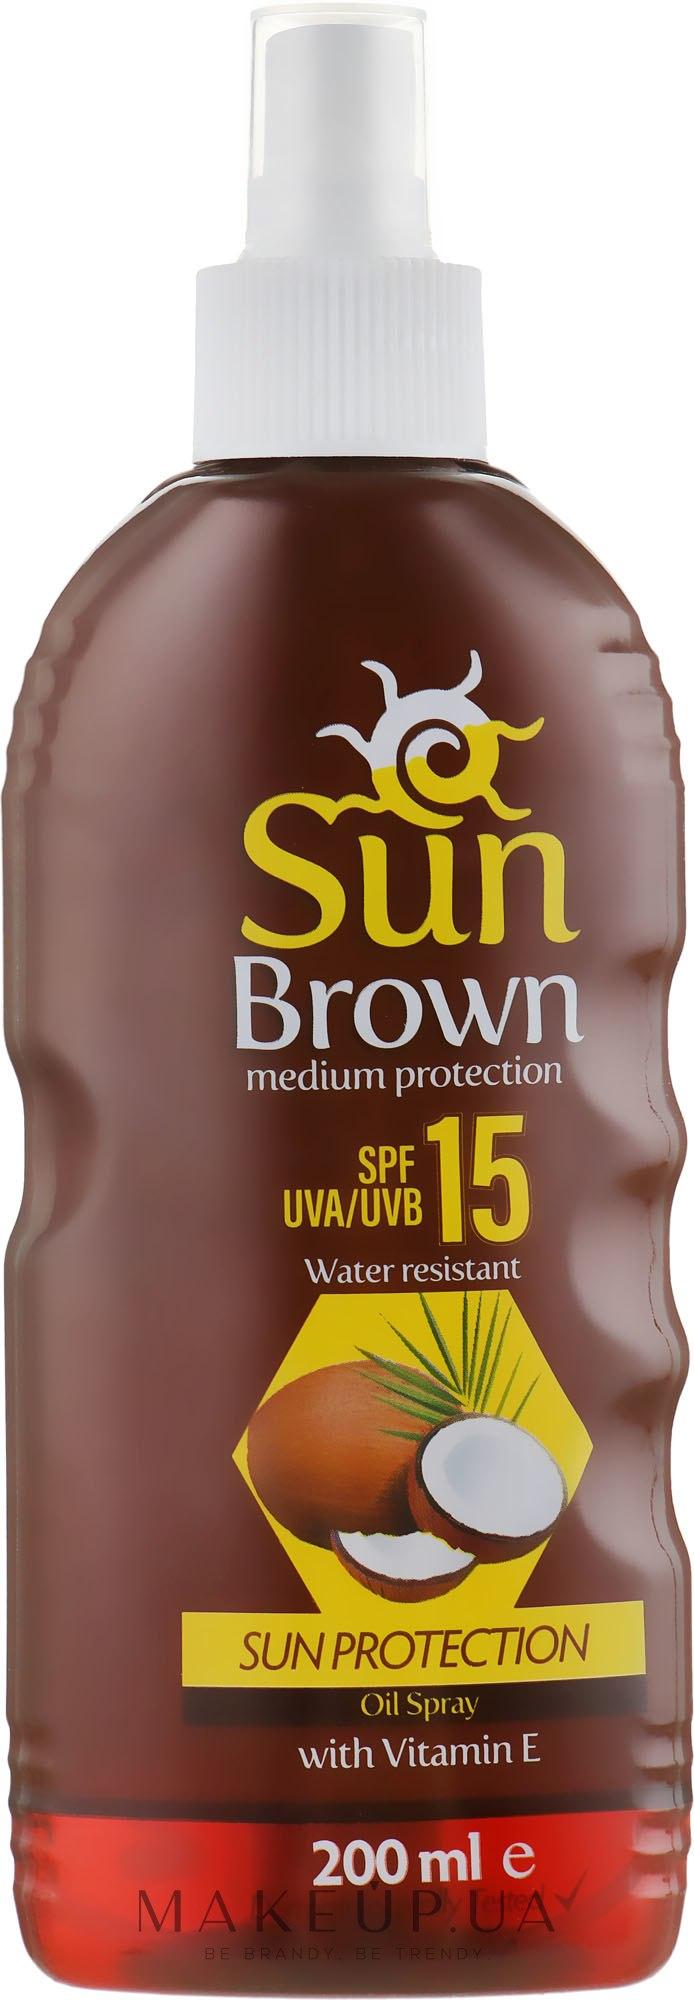 Солнцезащитное масло для усиления загара - Dalan Sun Brown Protection SPF 15 — фото 200ml